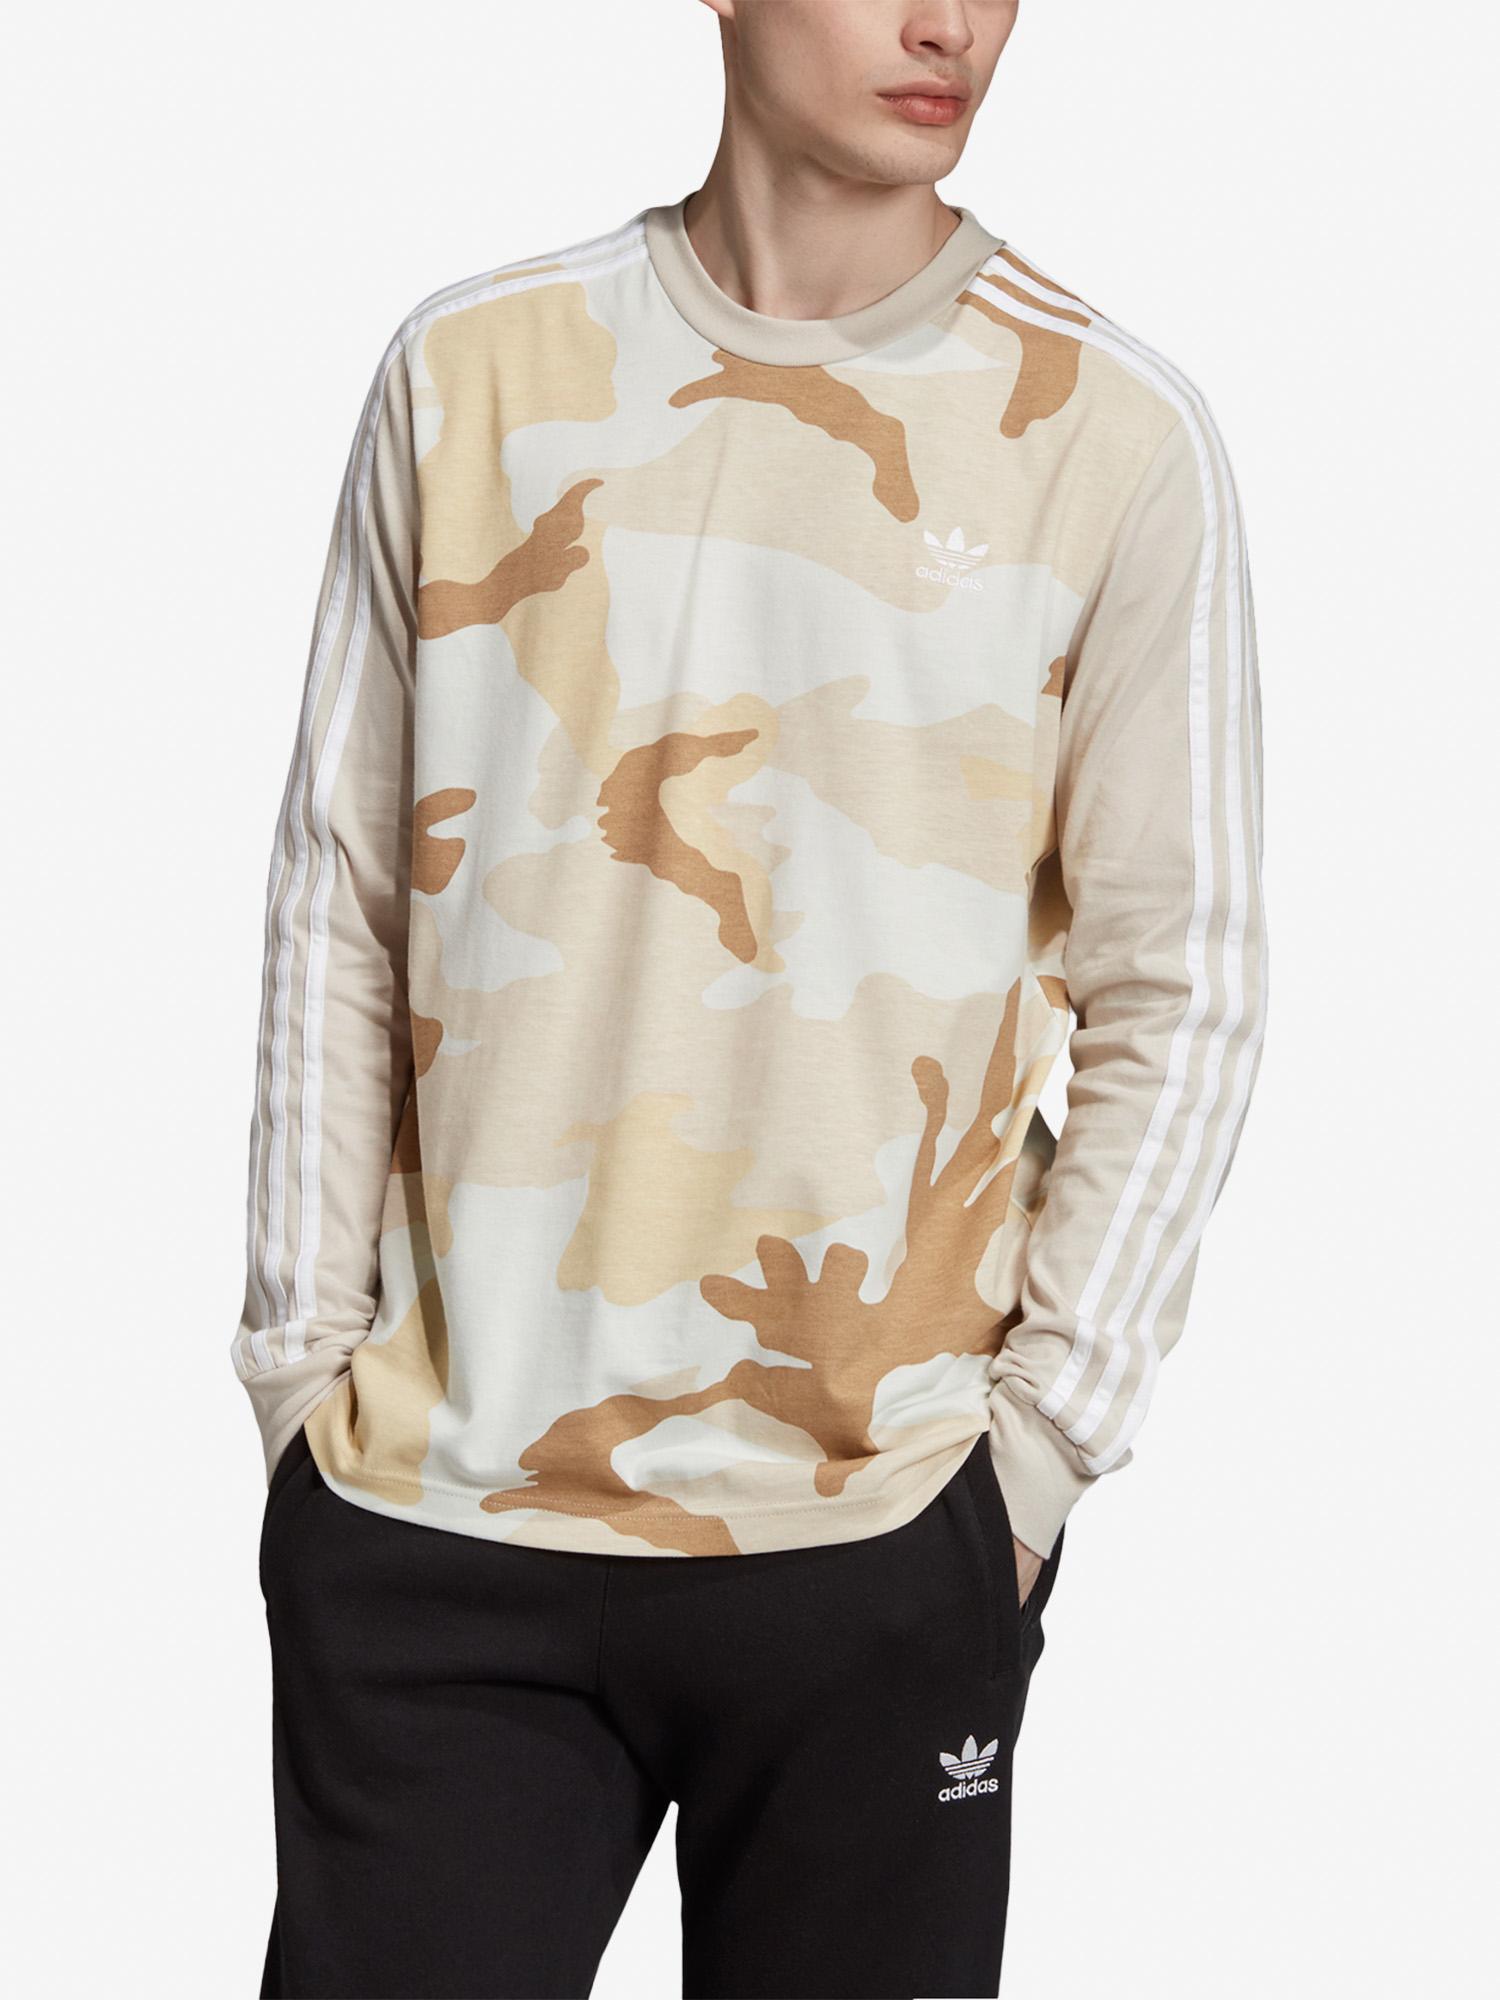 Adidas Originals Camo Ls Tee T-shirt